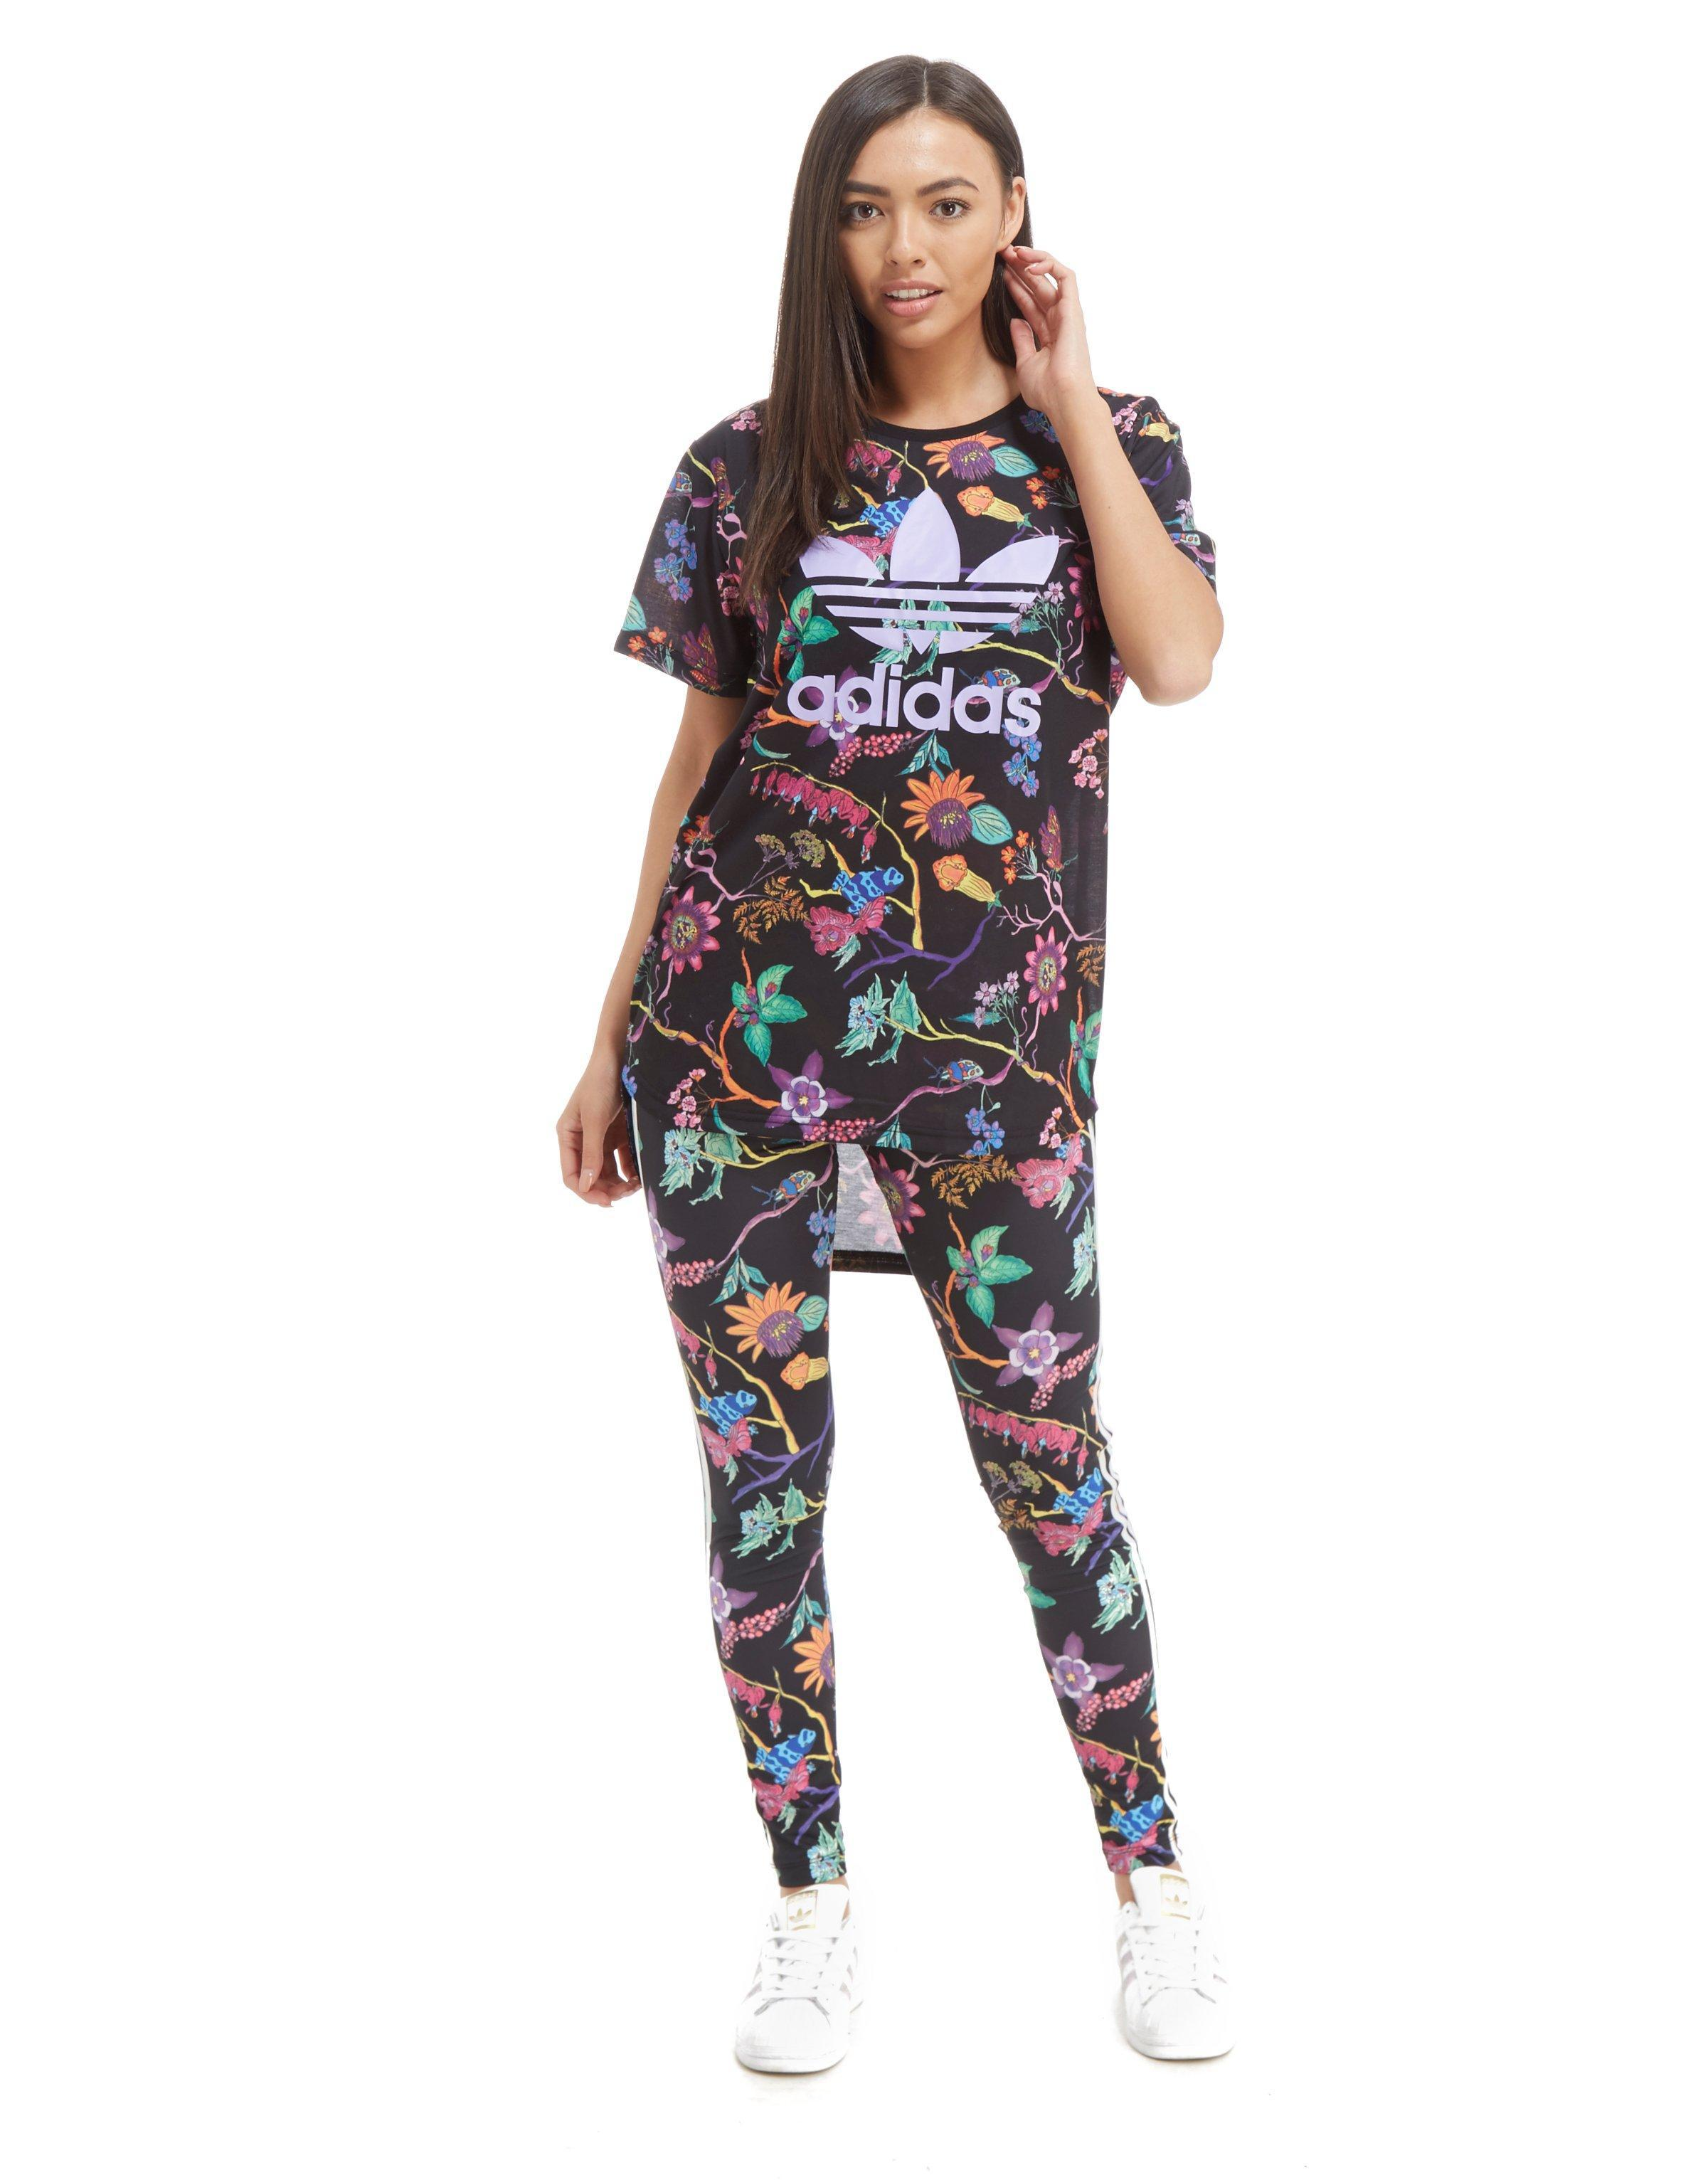 86b543ebfd0 adidas Originals Longline Trefoil All Over Print T-shirt - Lyst